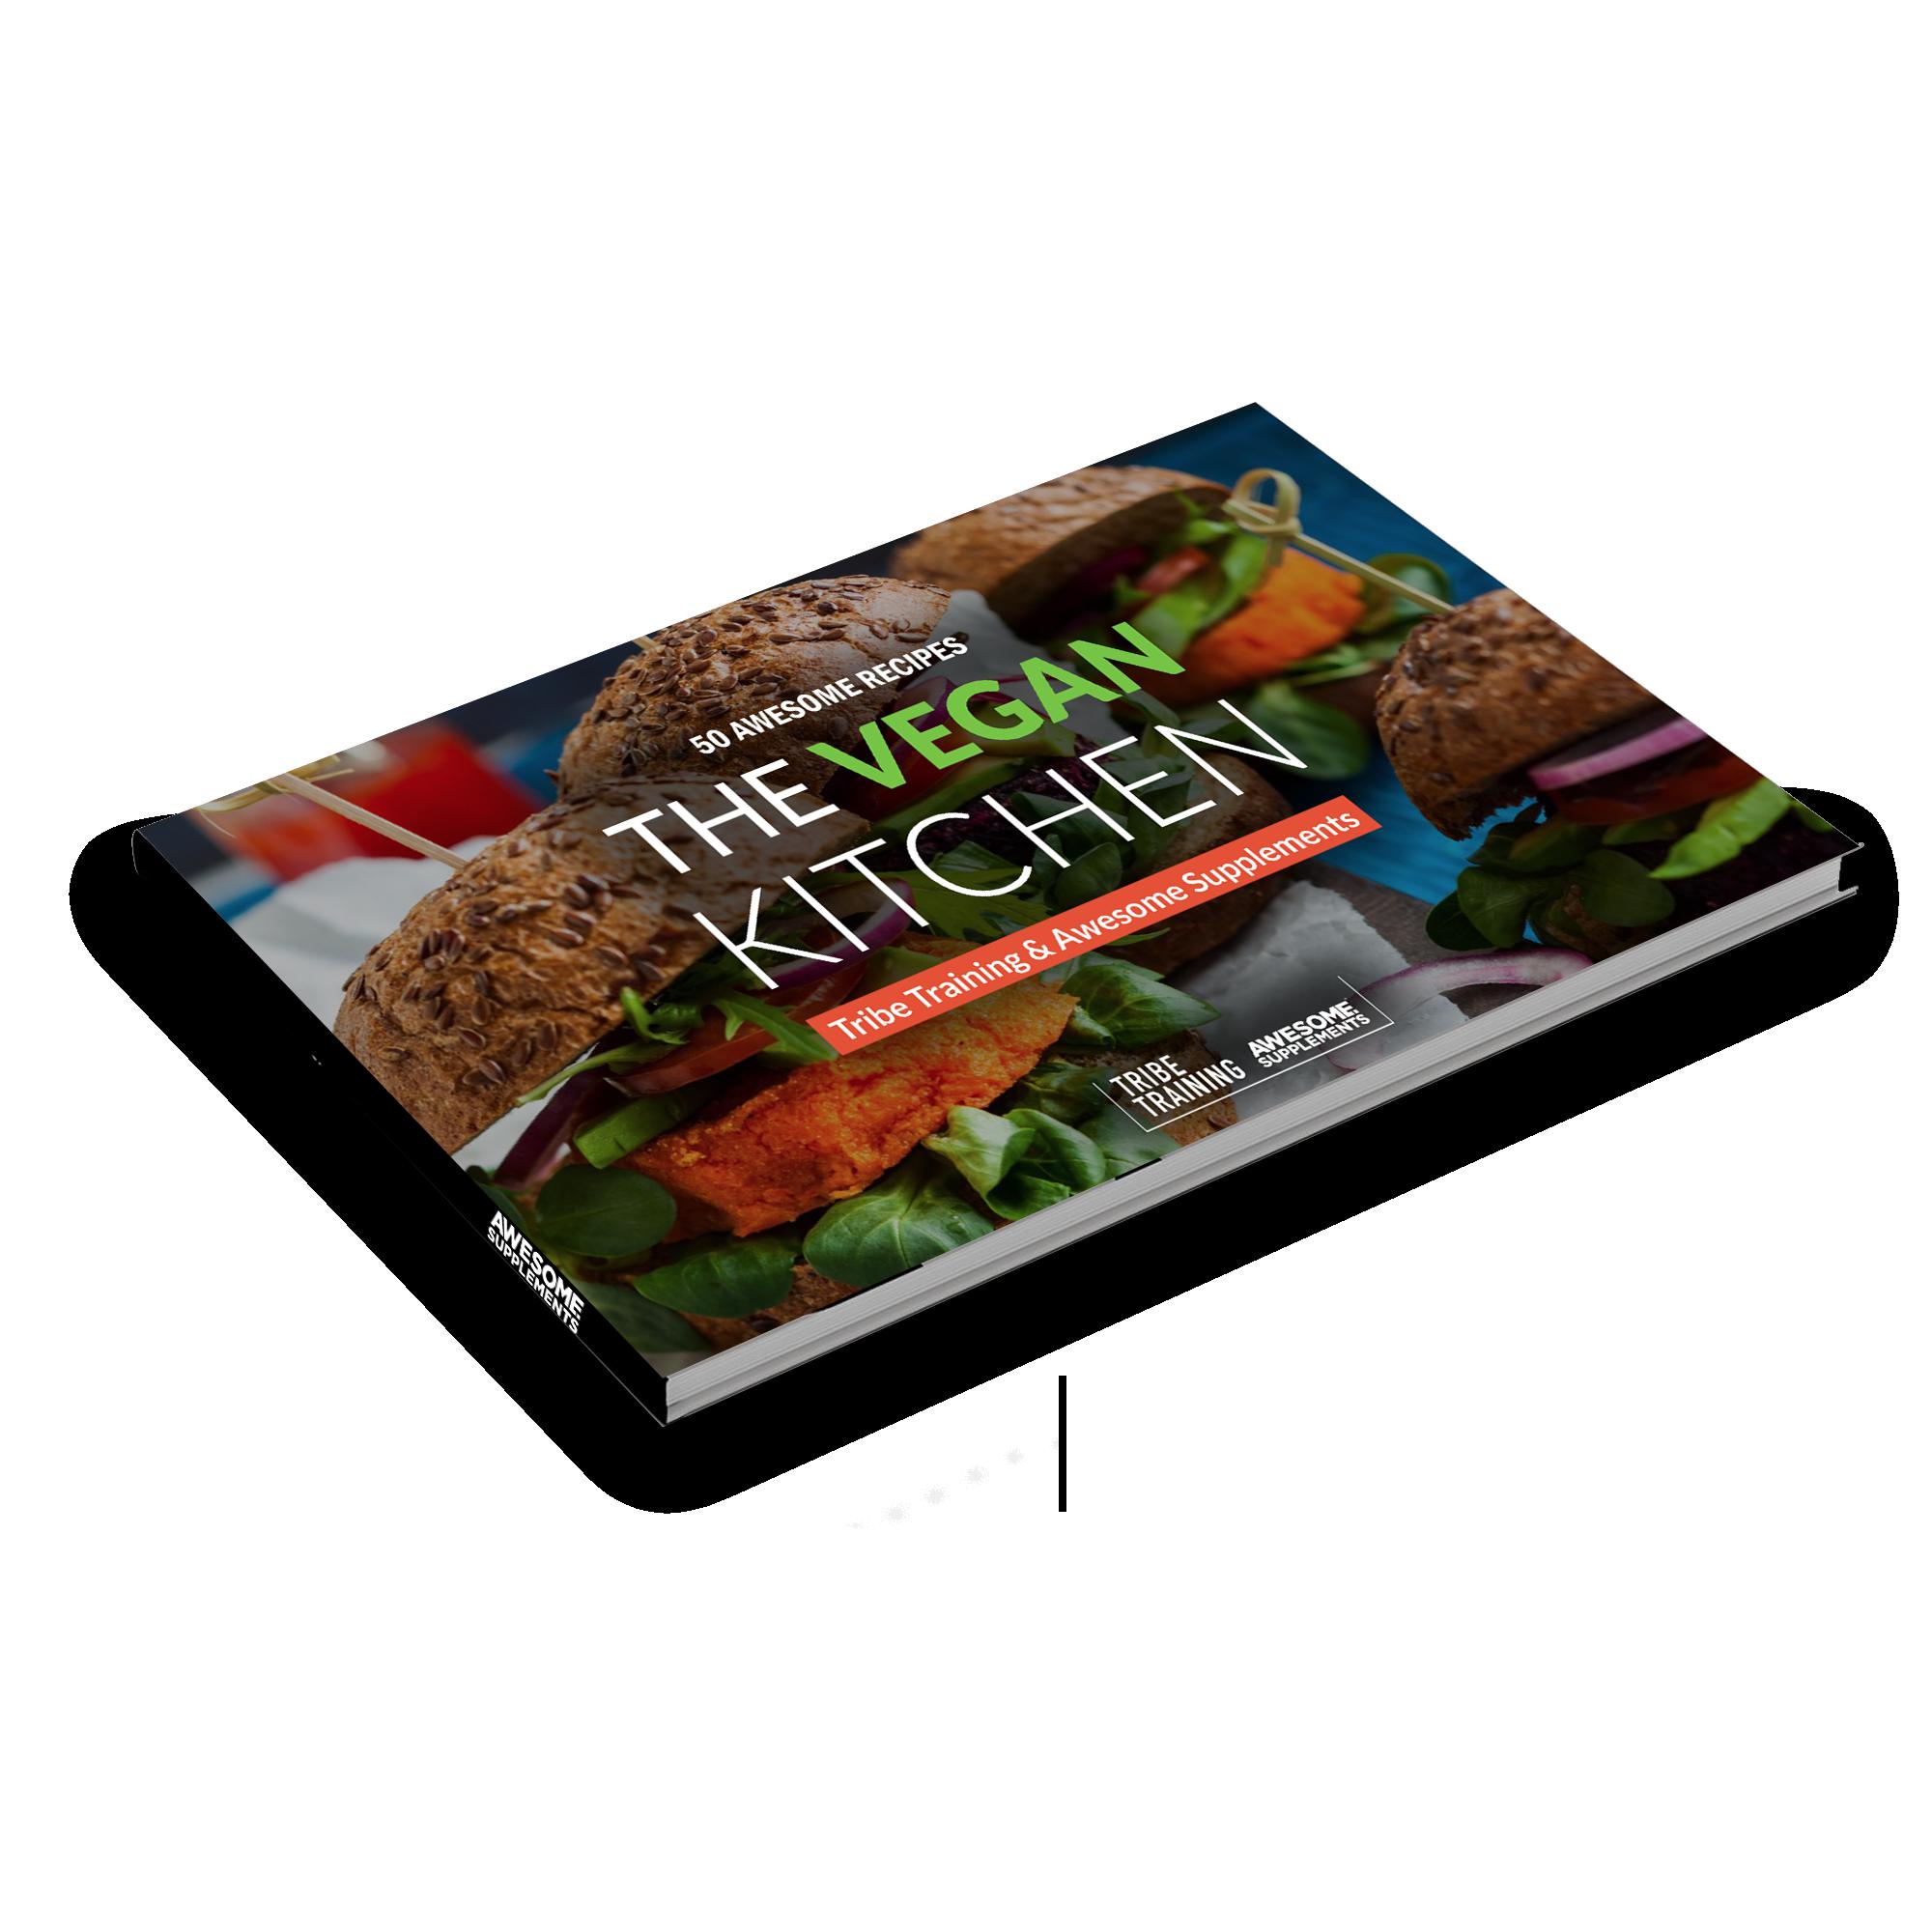 Awesome Vegan Cookbook